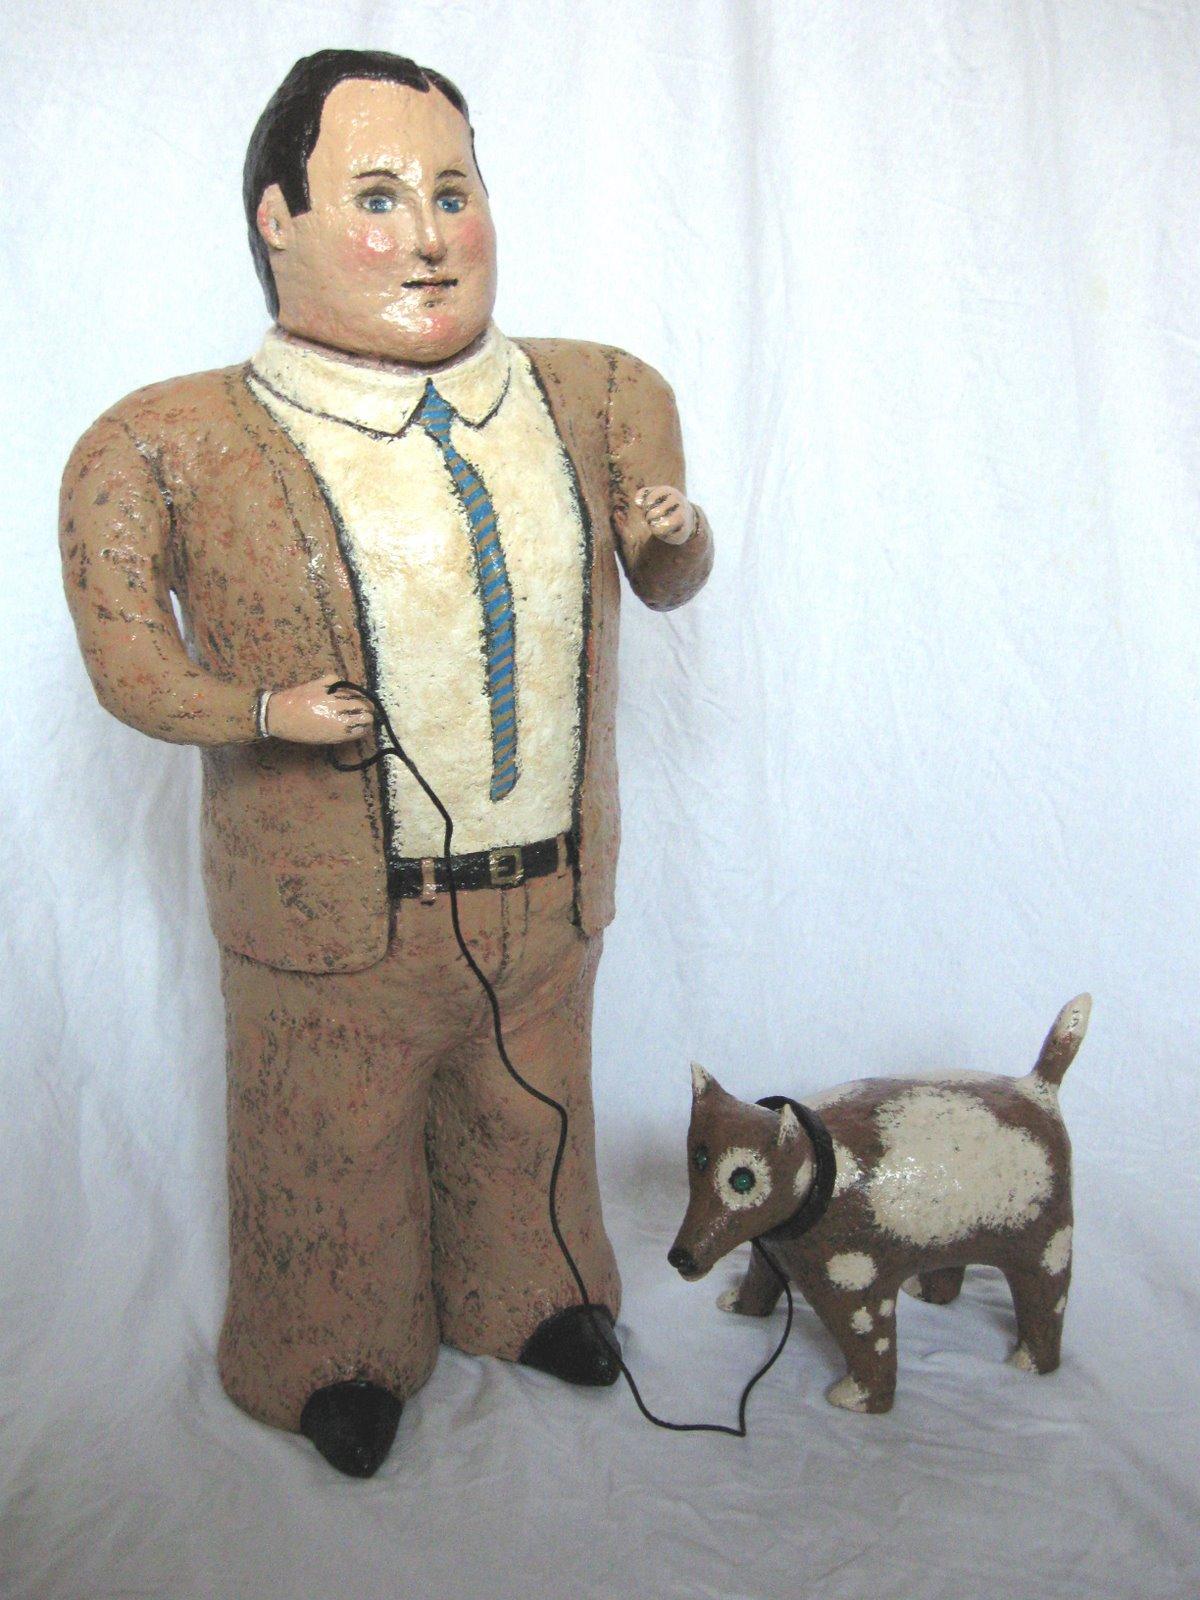 [Fat+man+withDog]